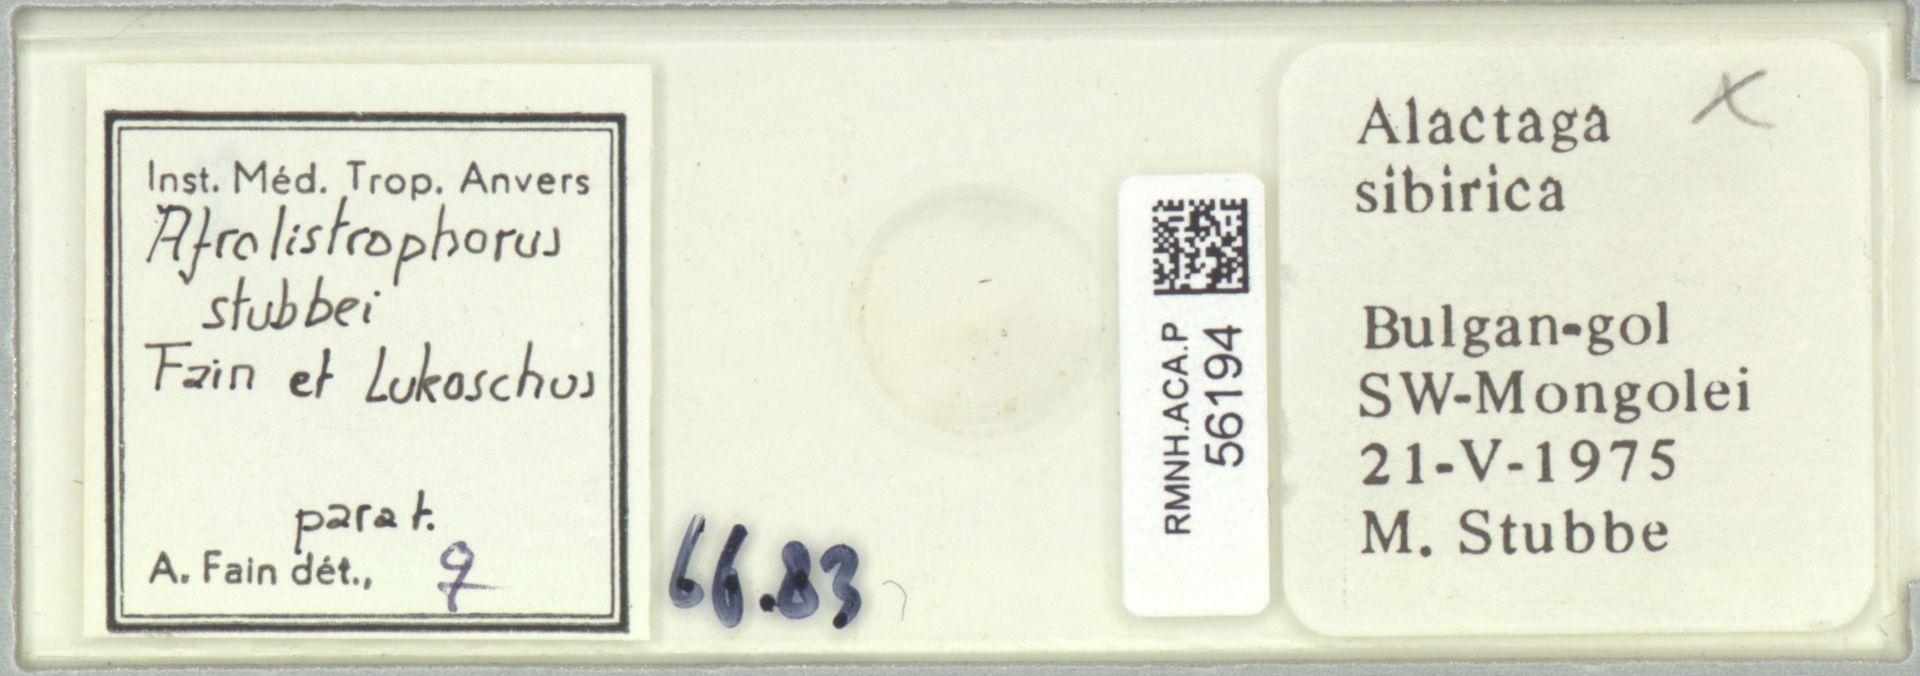 RMNH.ACA.P.56194 | Afrolistrophorus stubbei Fain et Lukoschus